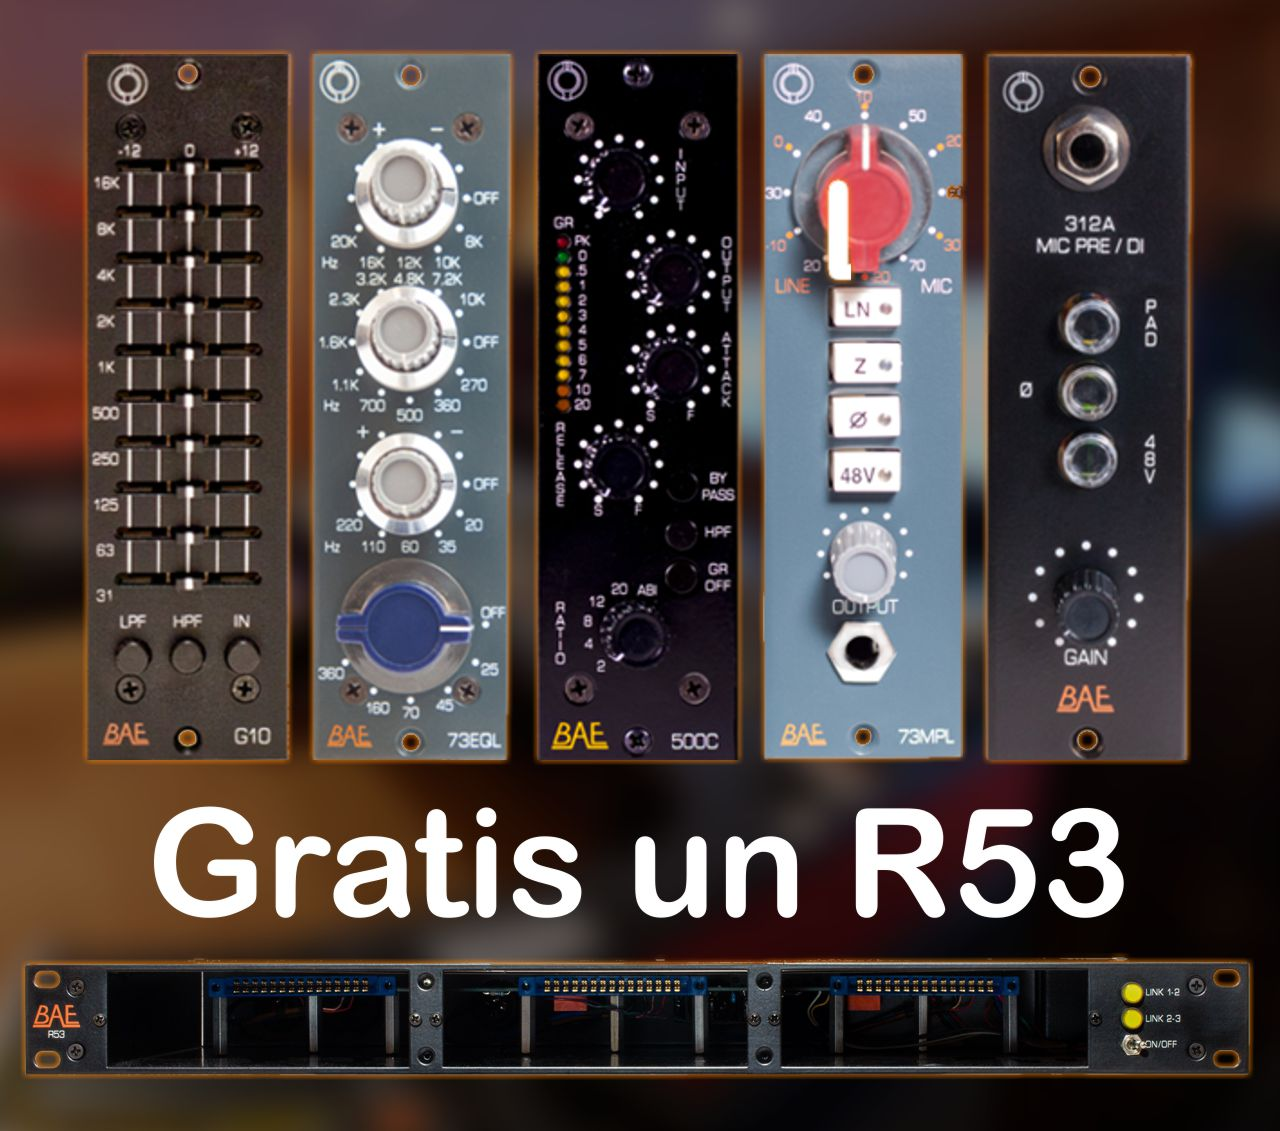 BAE R53 Rack GRATIS. ¡Oferta especial!